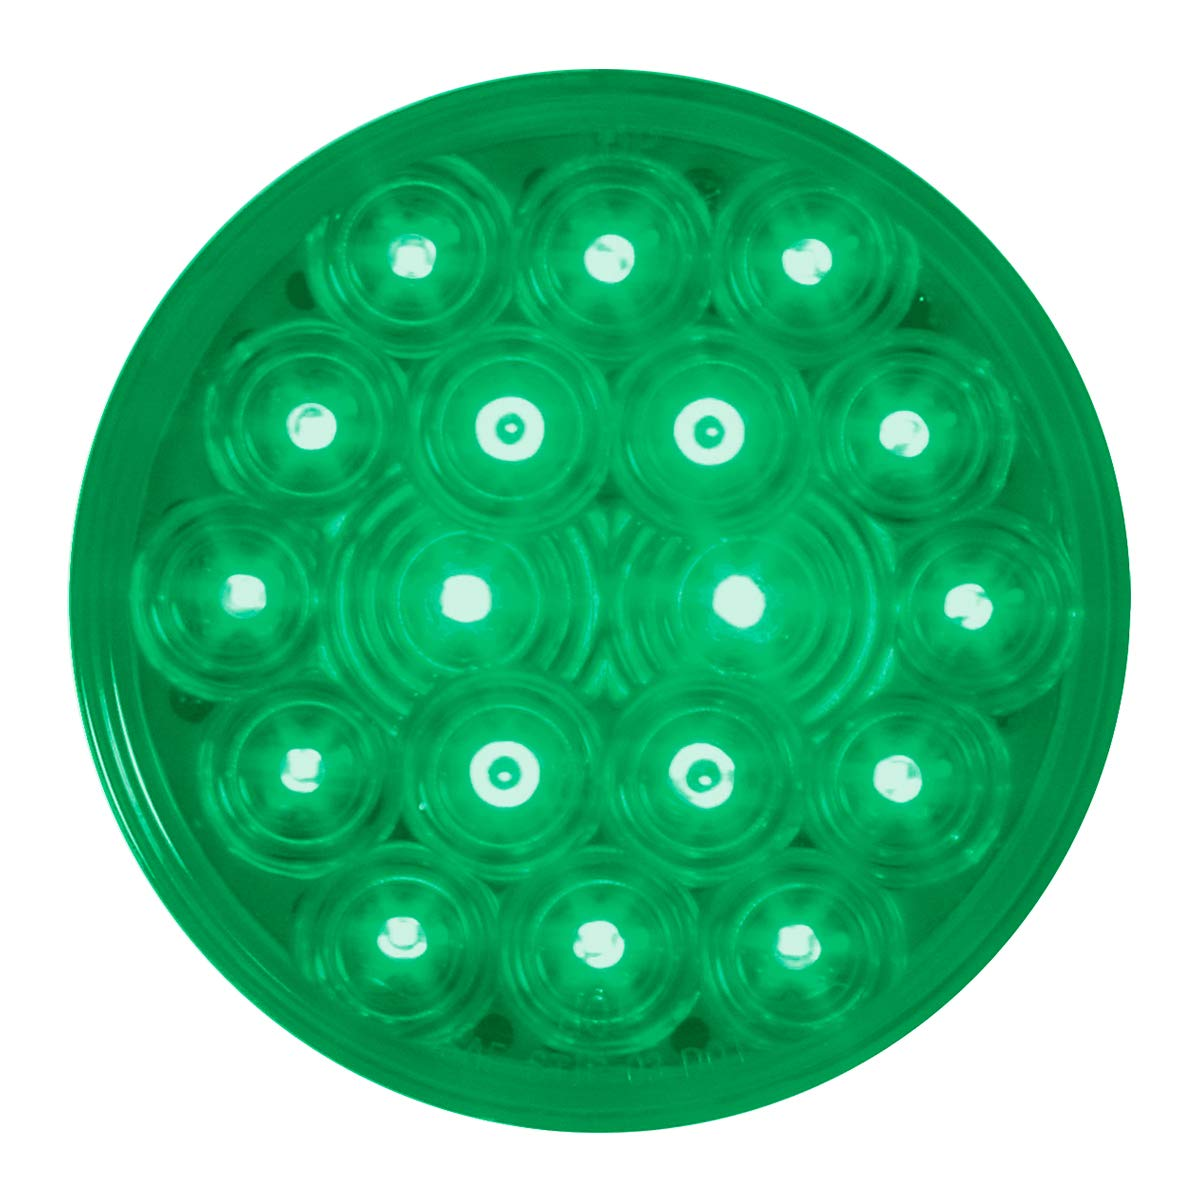 GG Grand General 76898 Sealed Light (4'' Fleet Green 18 LED (Interior)) by GG Grand General